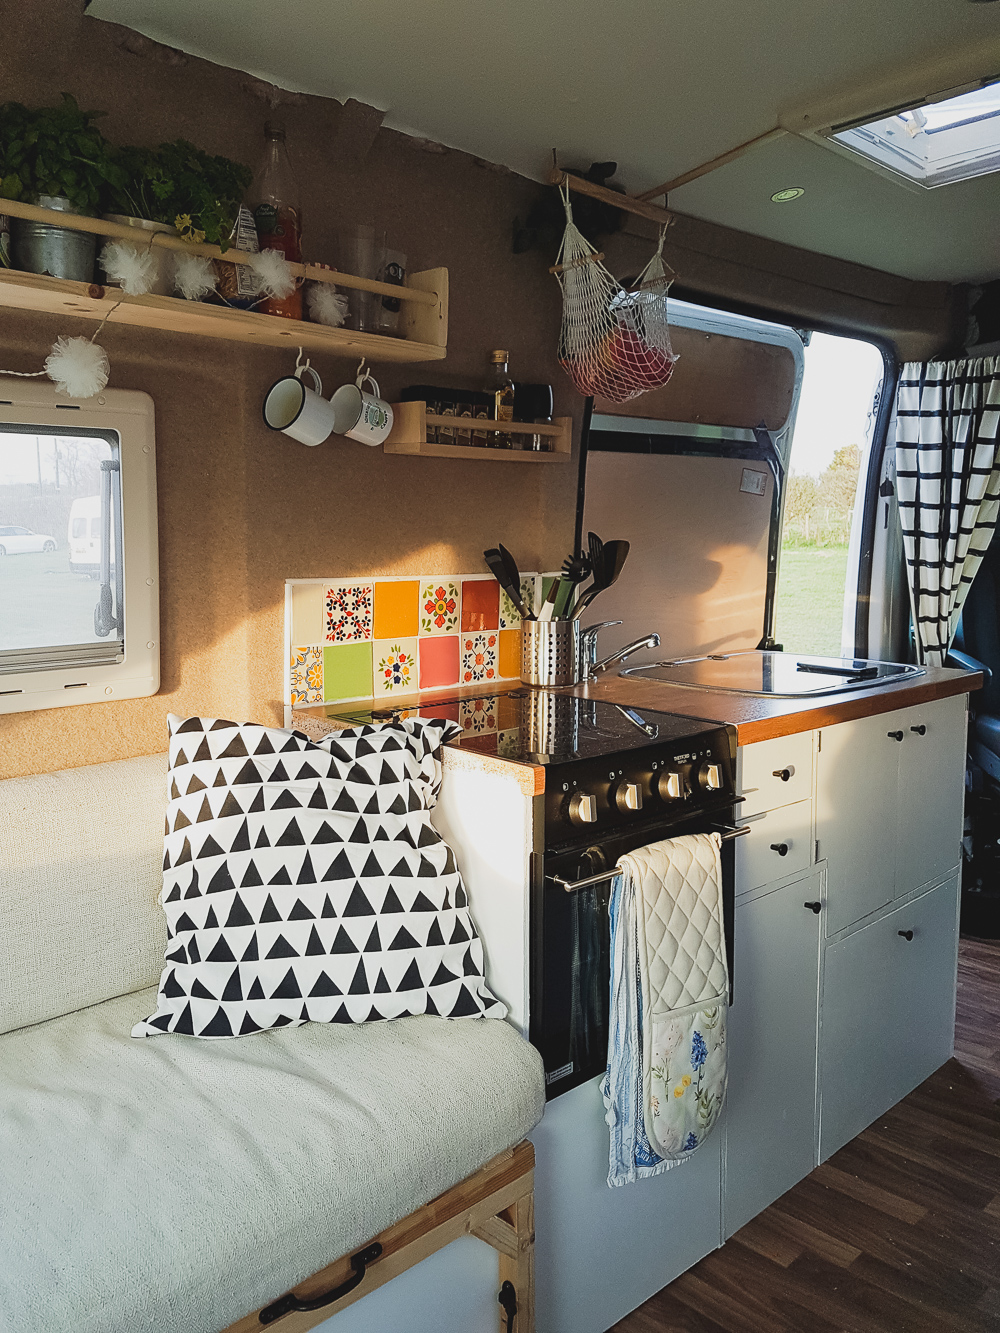 Adventures in a Camper, Campervan